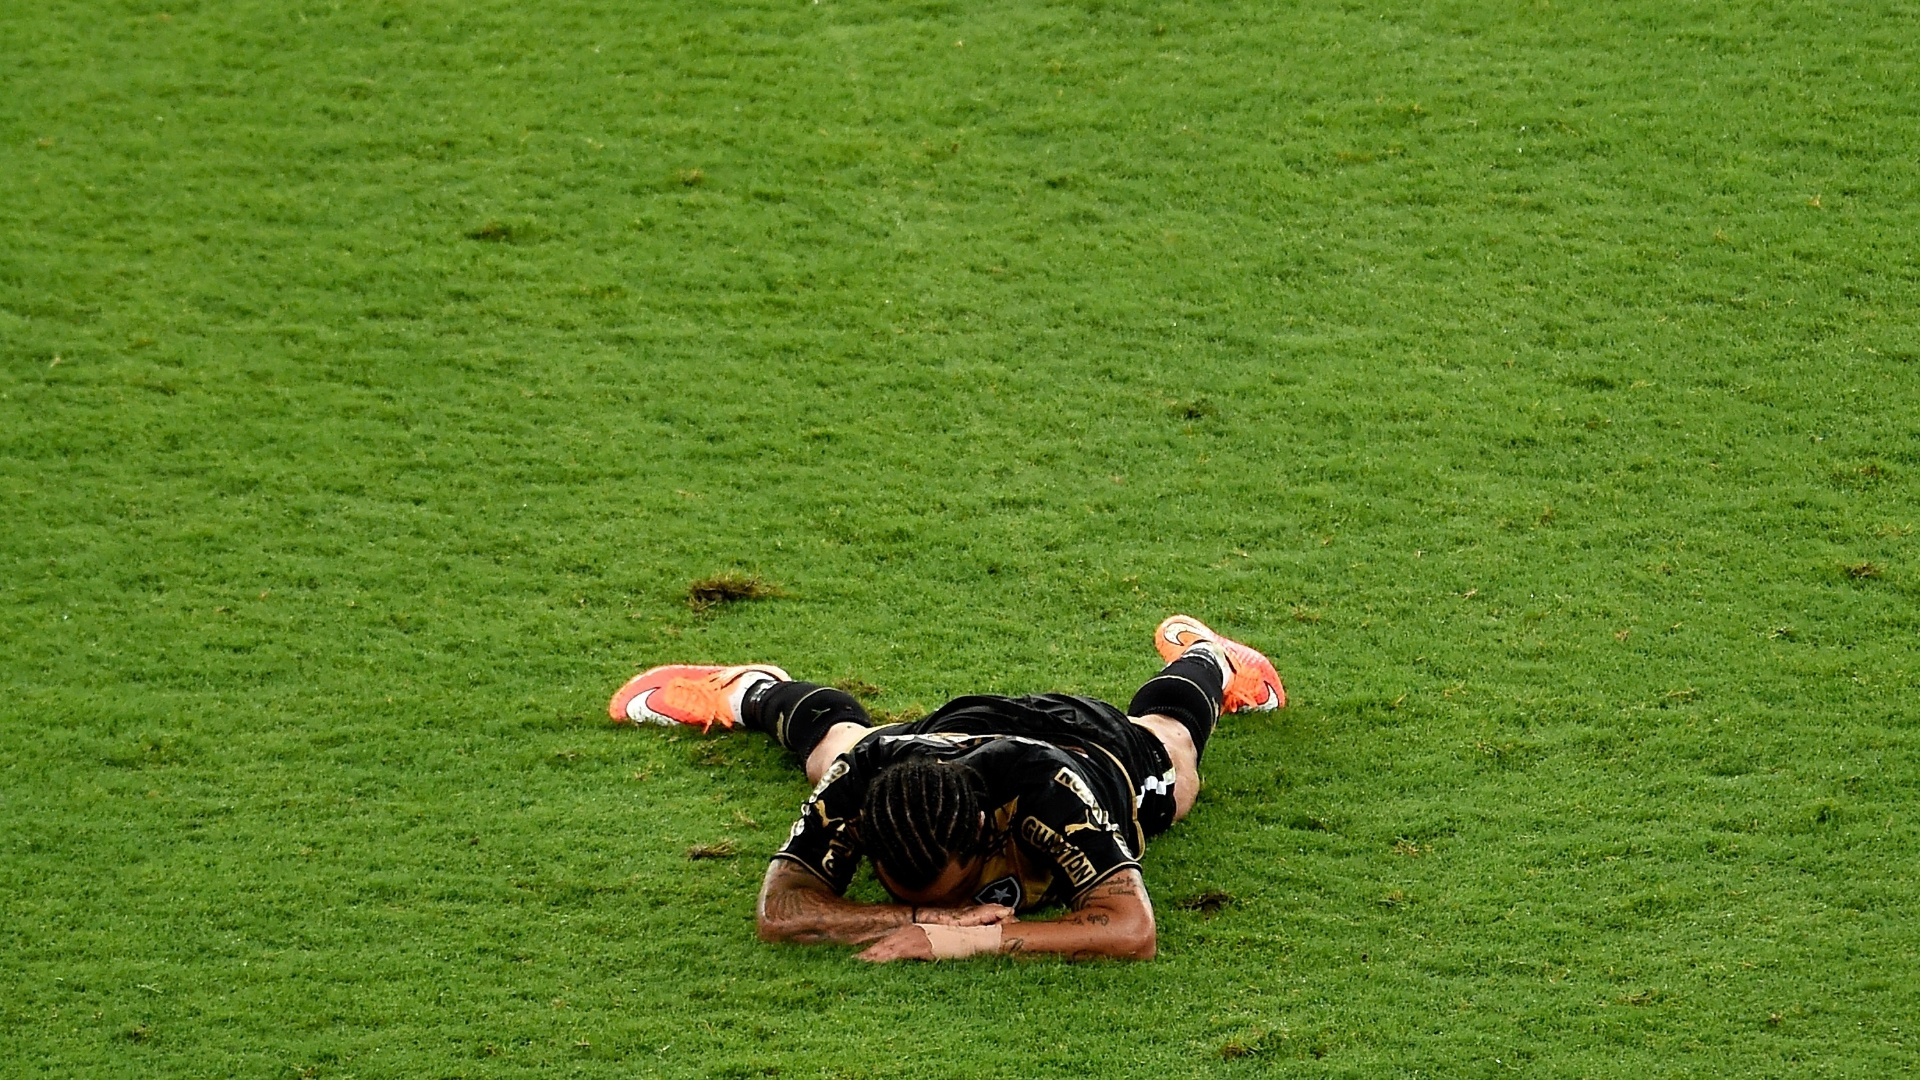 Carlos Alberto, desolado no gramado, lamenta derrota do Botafogo